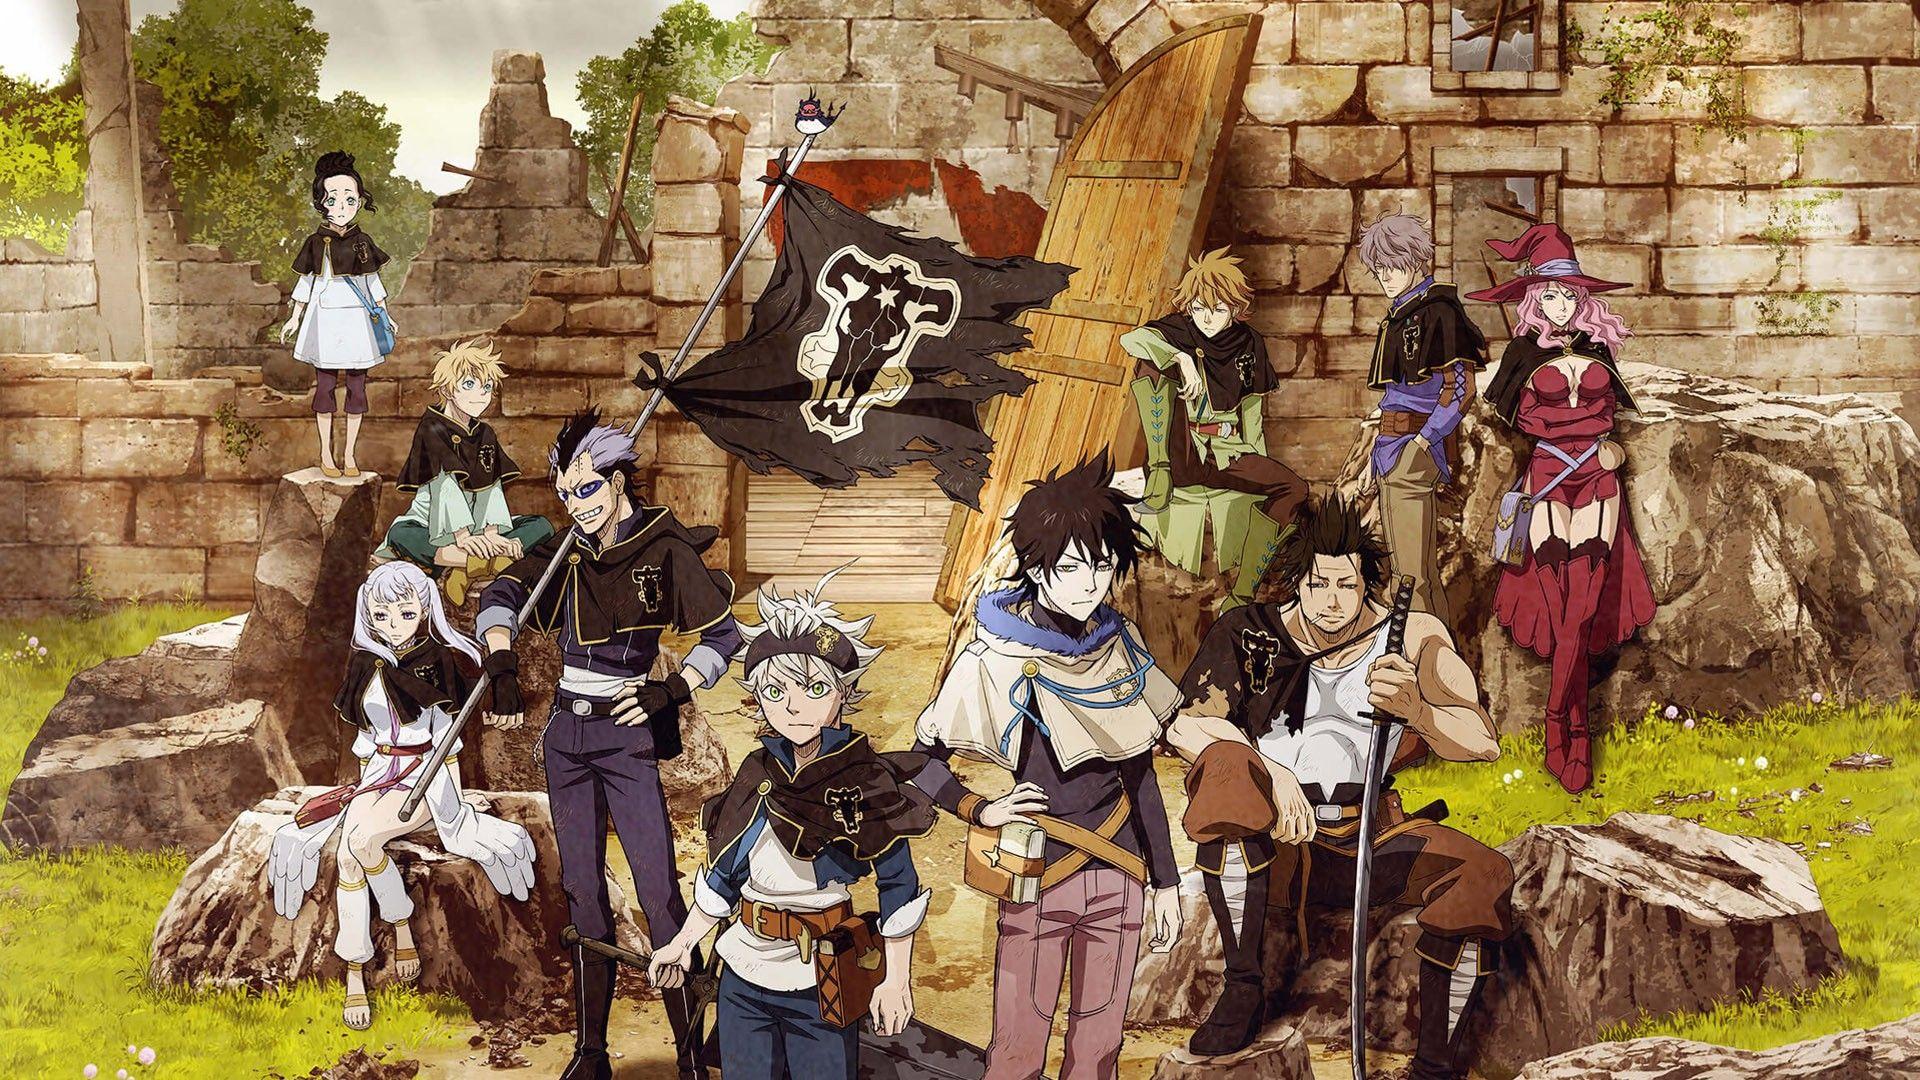 Pin De Stitis En Anime Wallpaper Hd Wallpaper De Anime Personajes De Anime Arte De Pelo